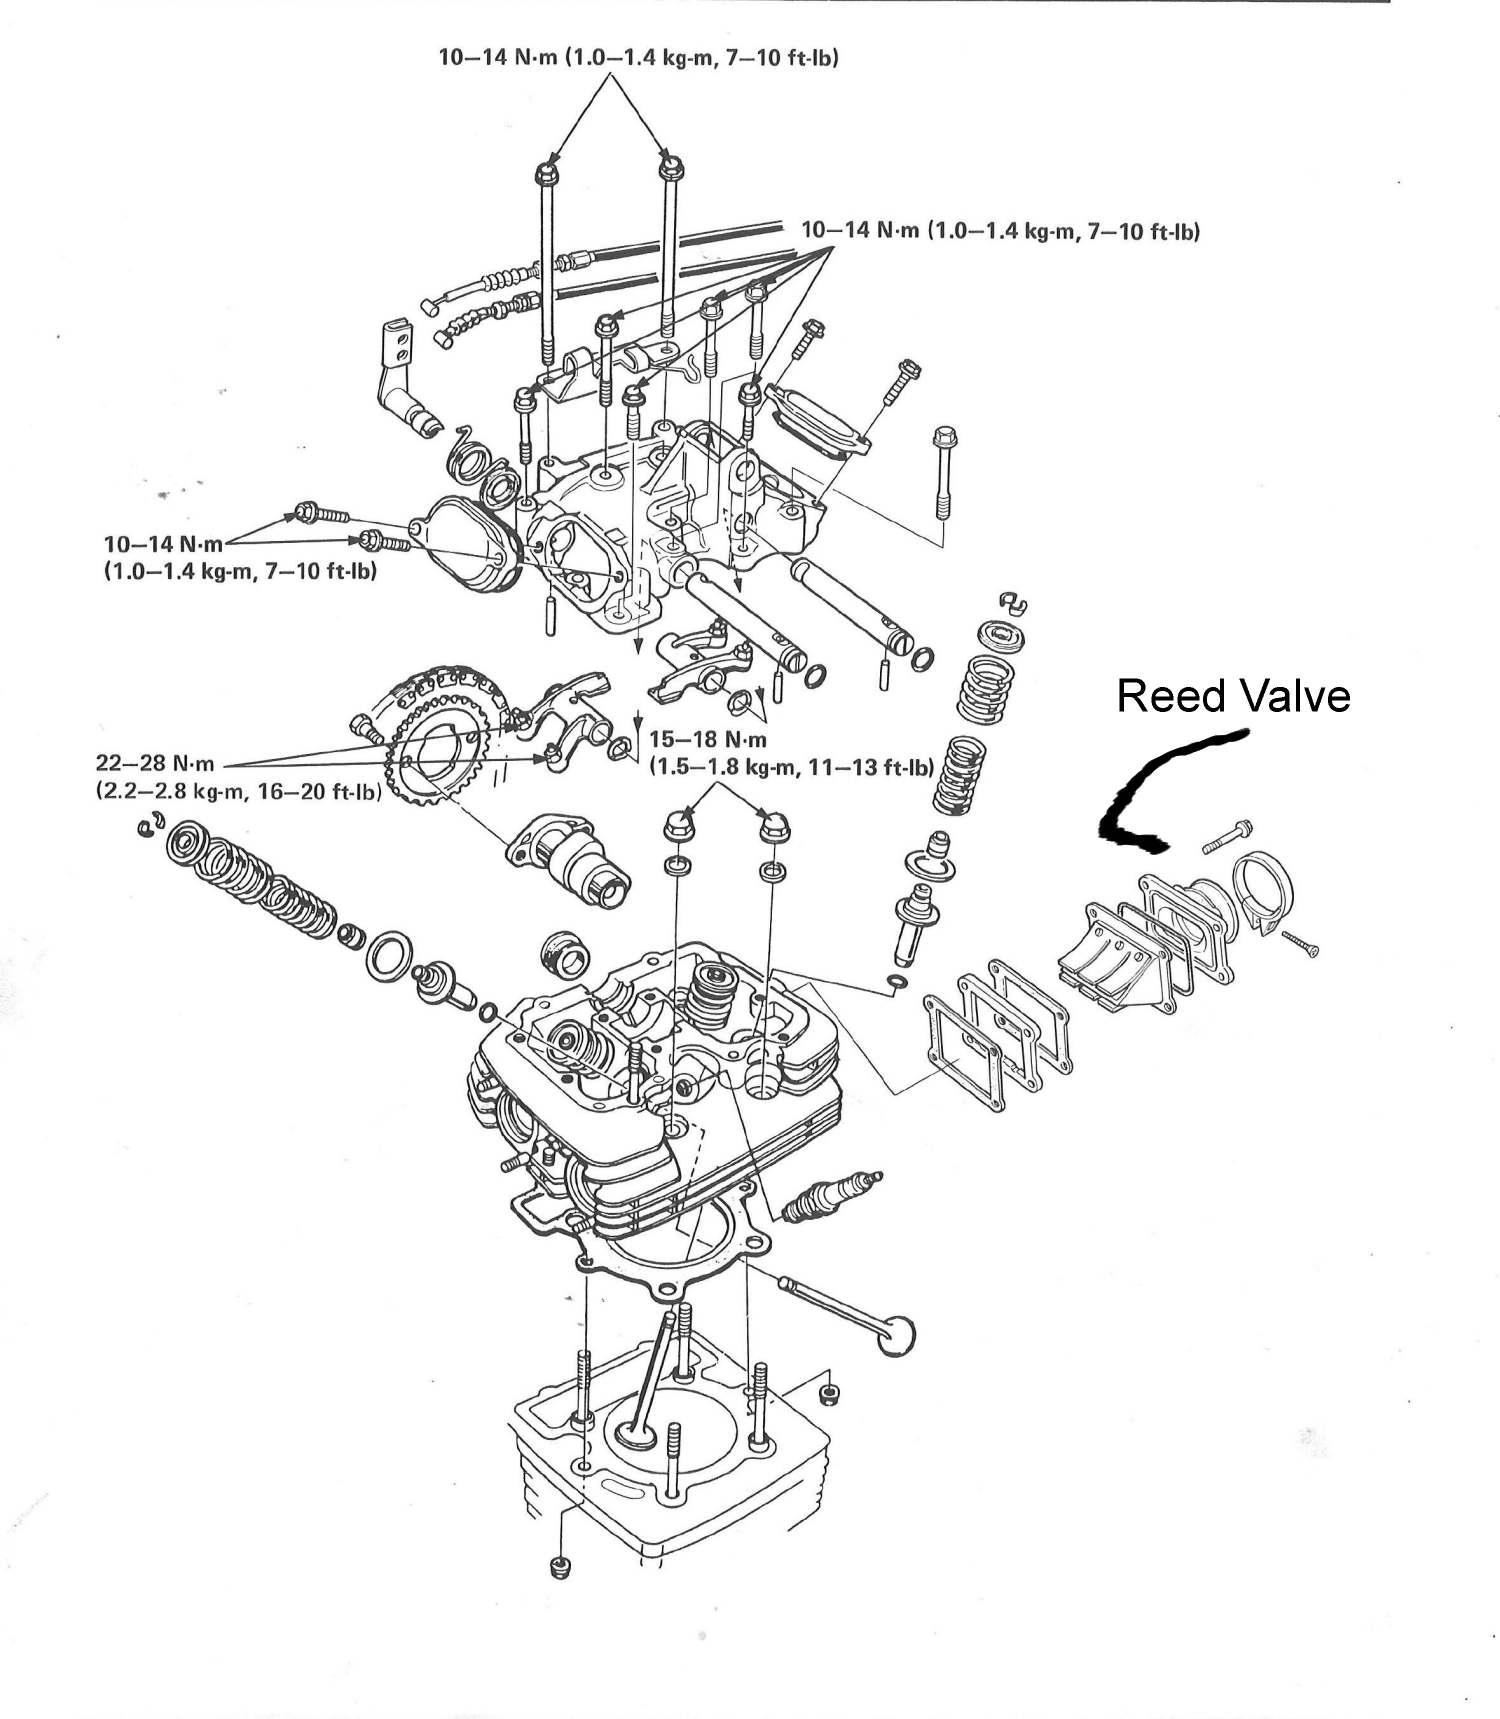 2 Stroke Reed Valve Problems | Wiring Diagram Database